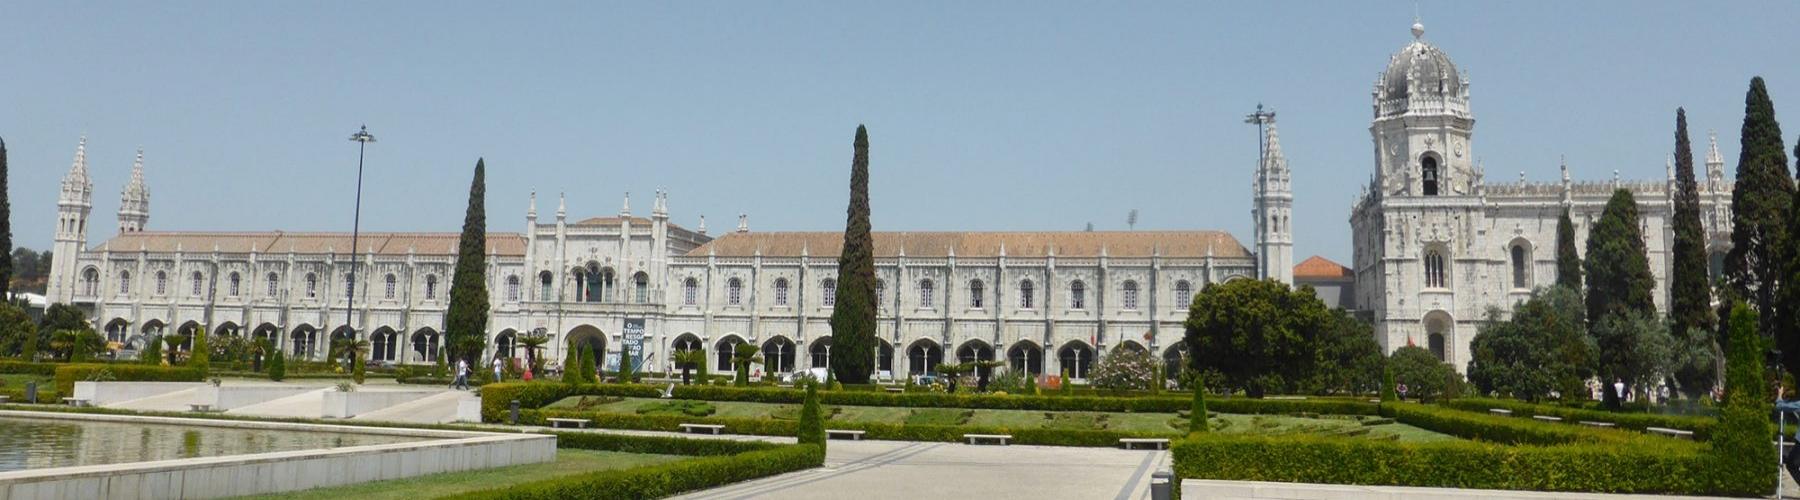 Voyage organis au portugal for Voyage organise jardins anglais